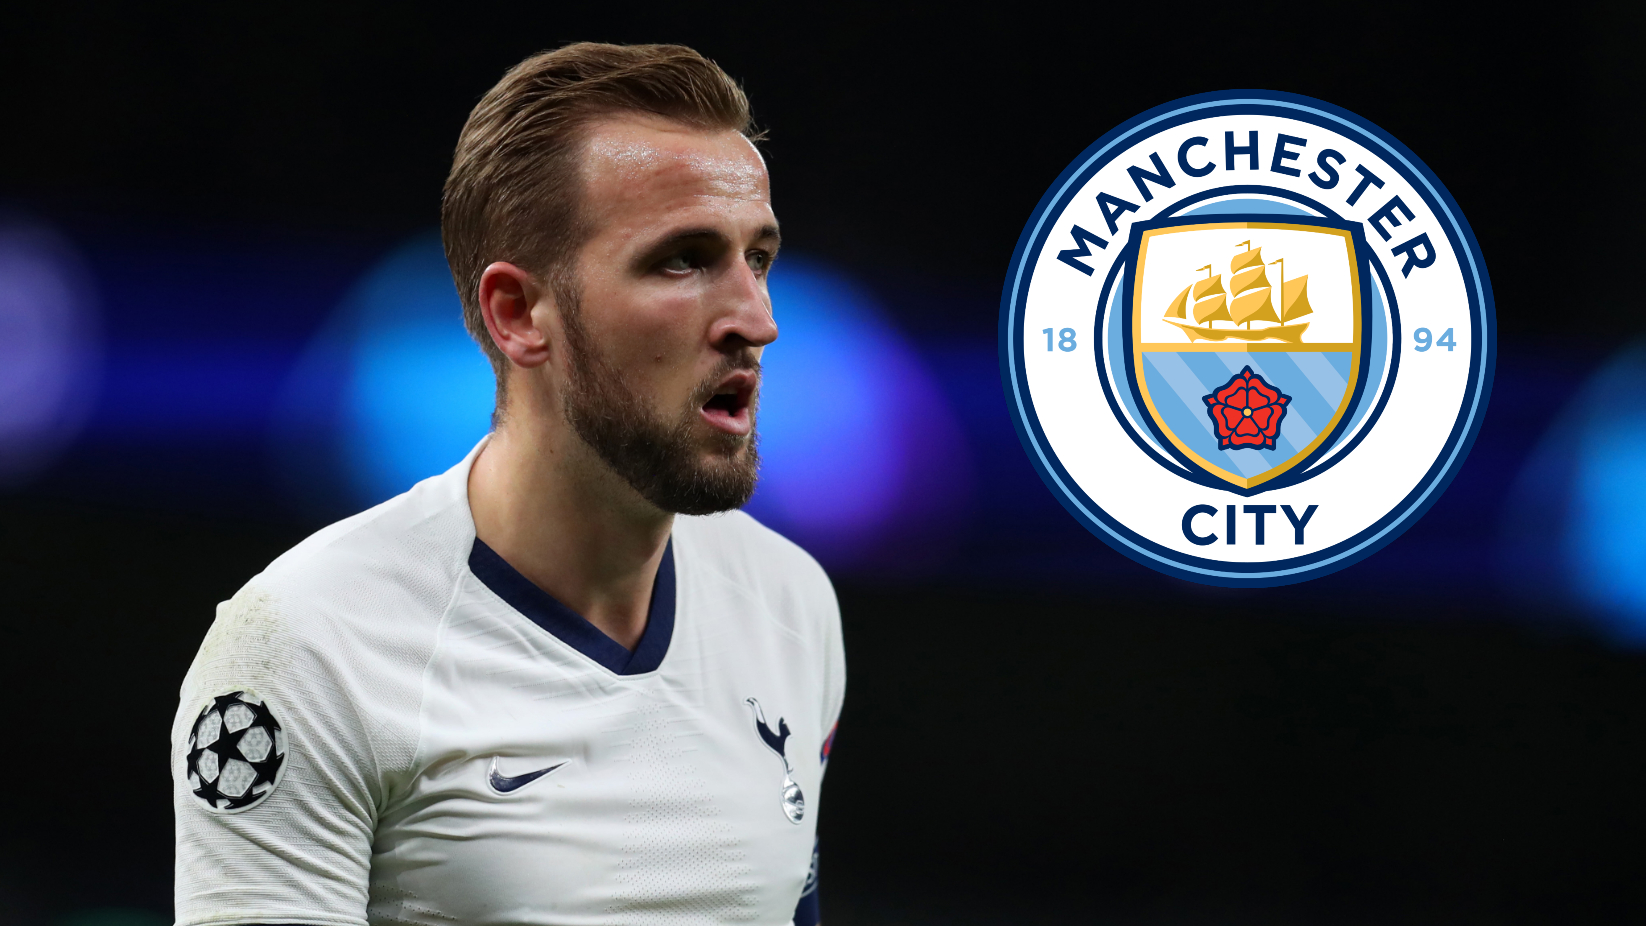 Kane a great fit for Man City, says former Tottenham boss Redknapp